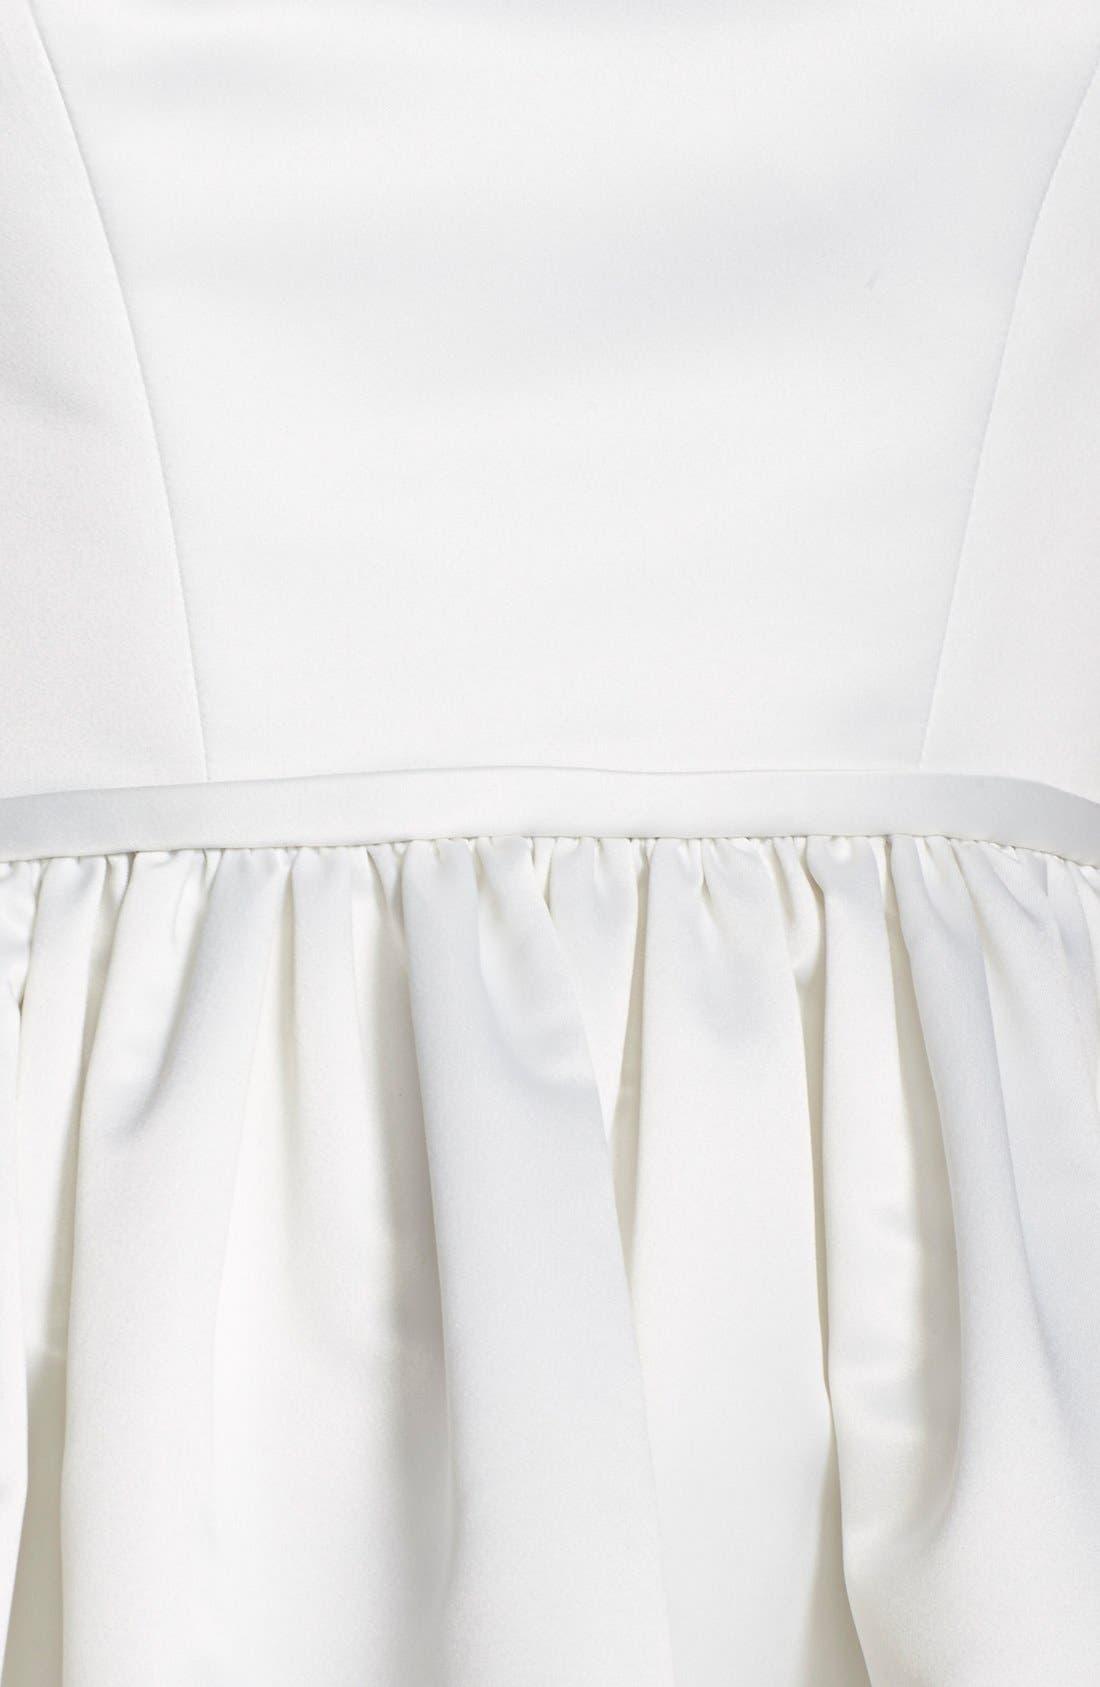 Alternate Image 3  - ERIN erin fetherston 'Savannah' Satin Fit & Flare Dress